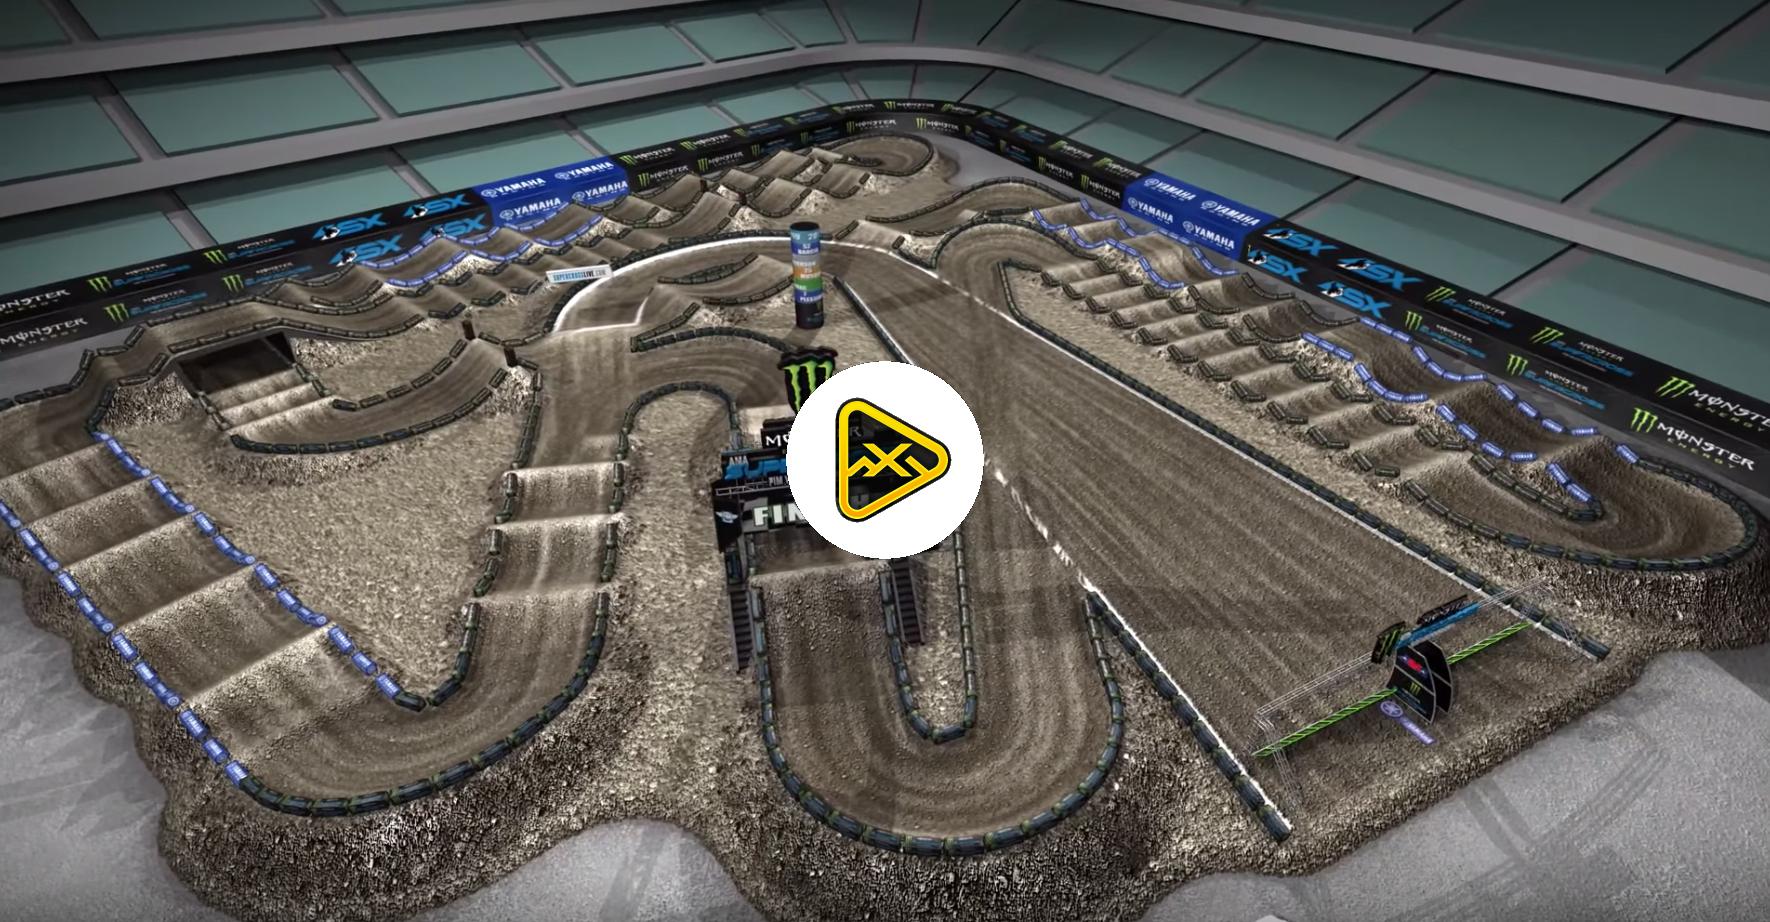 2019 Anaheim 1 SX Animated Track Map